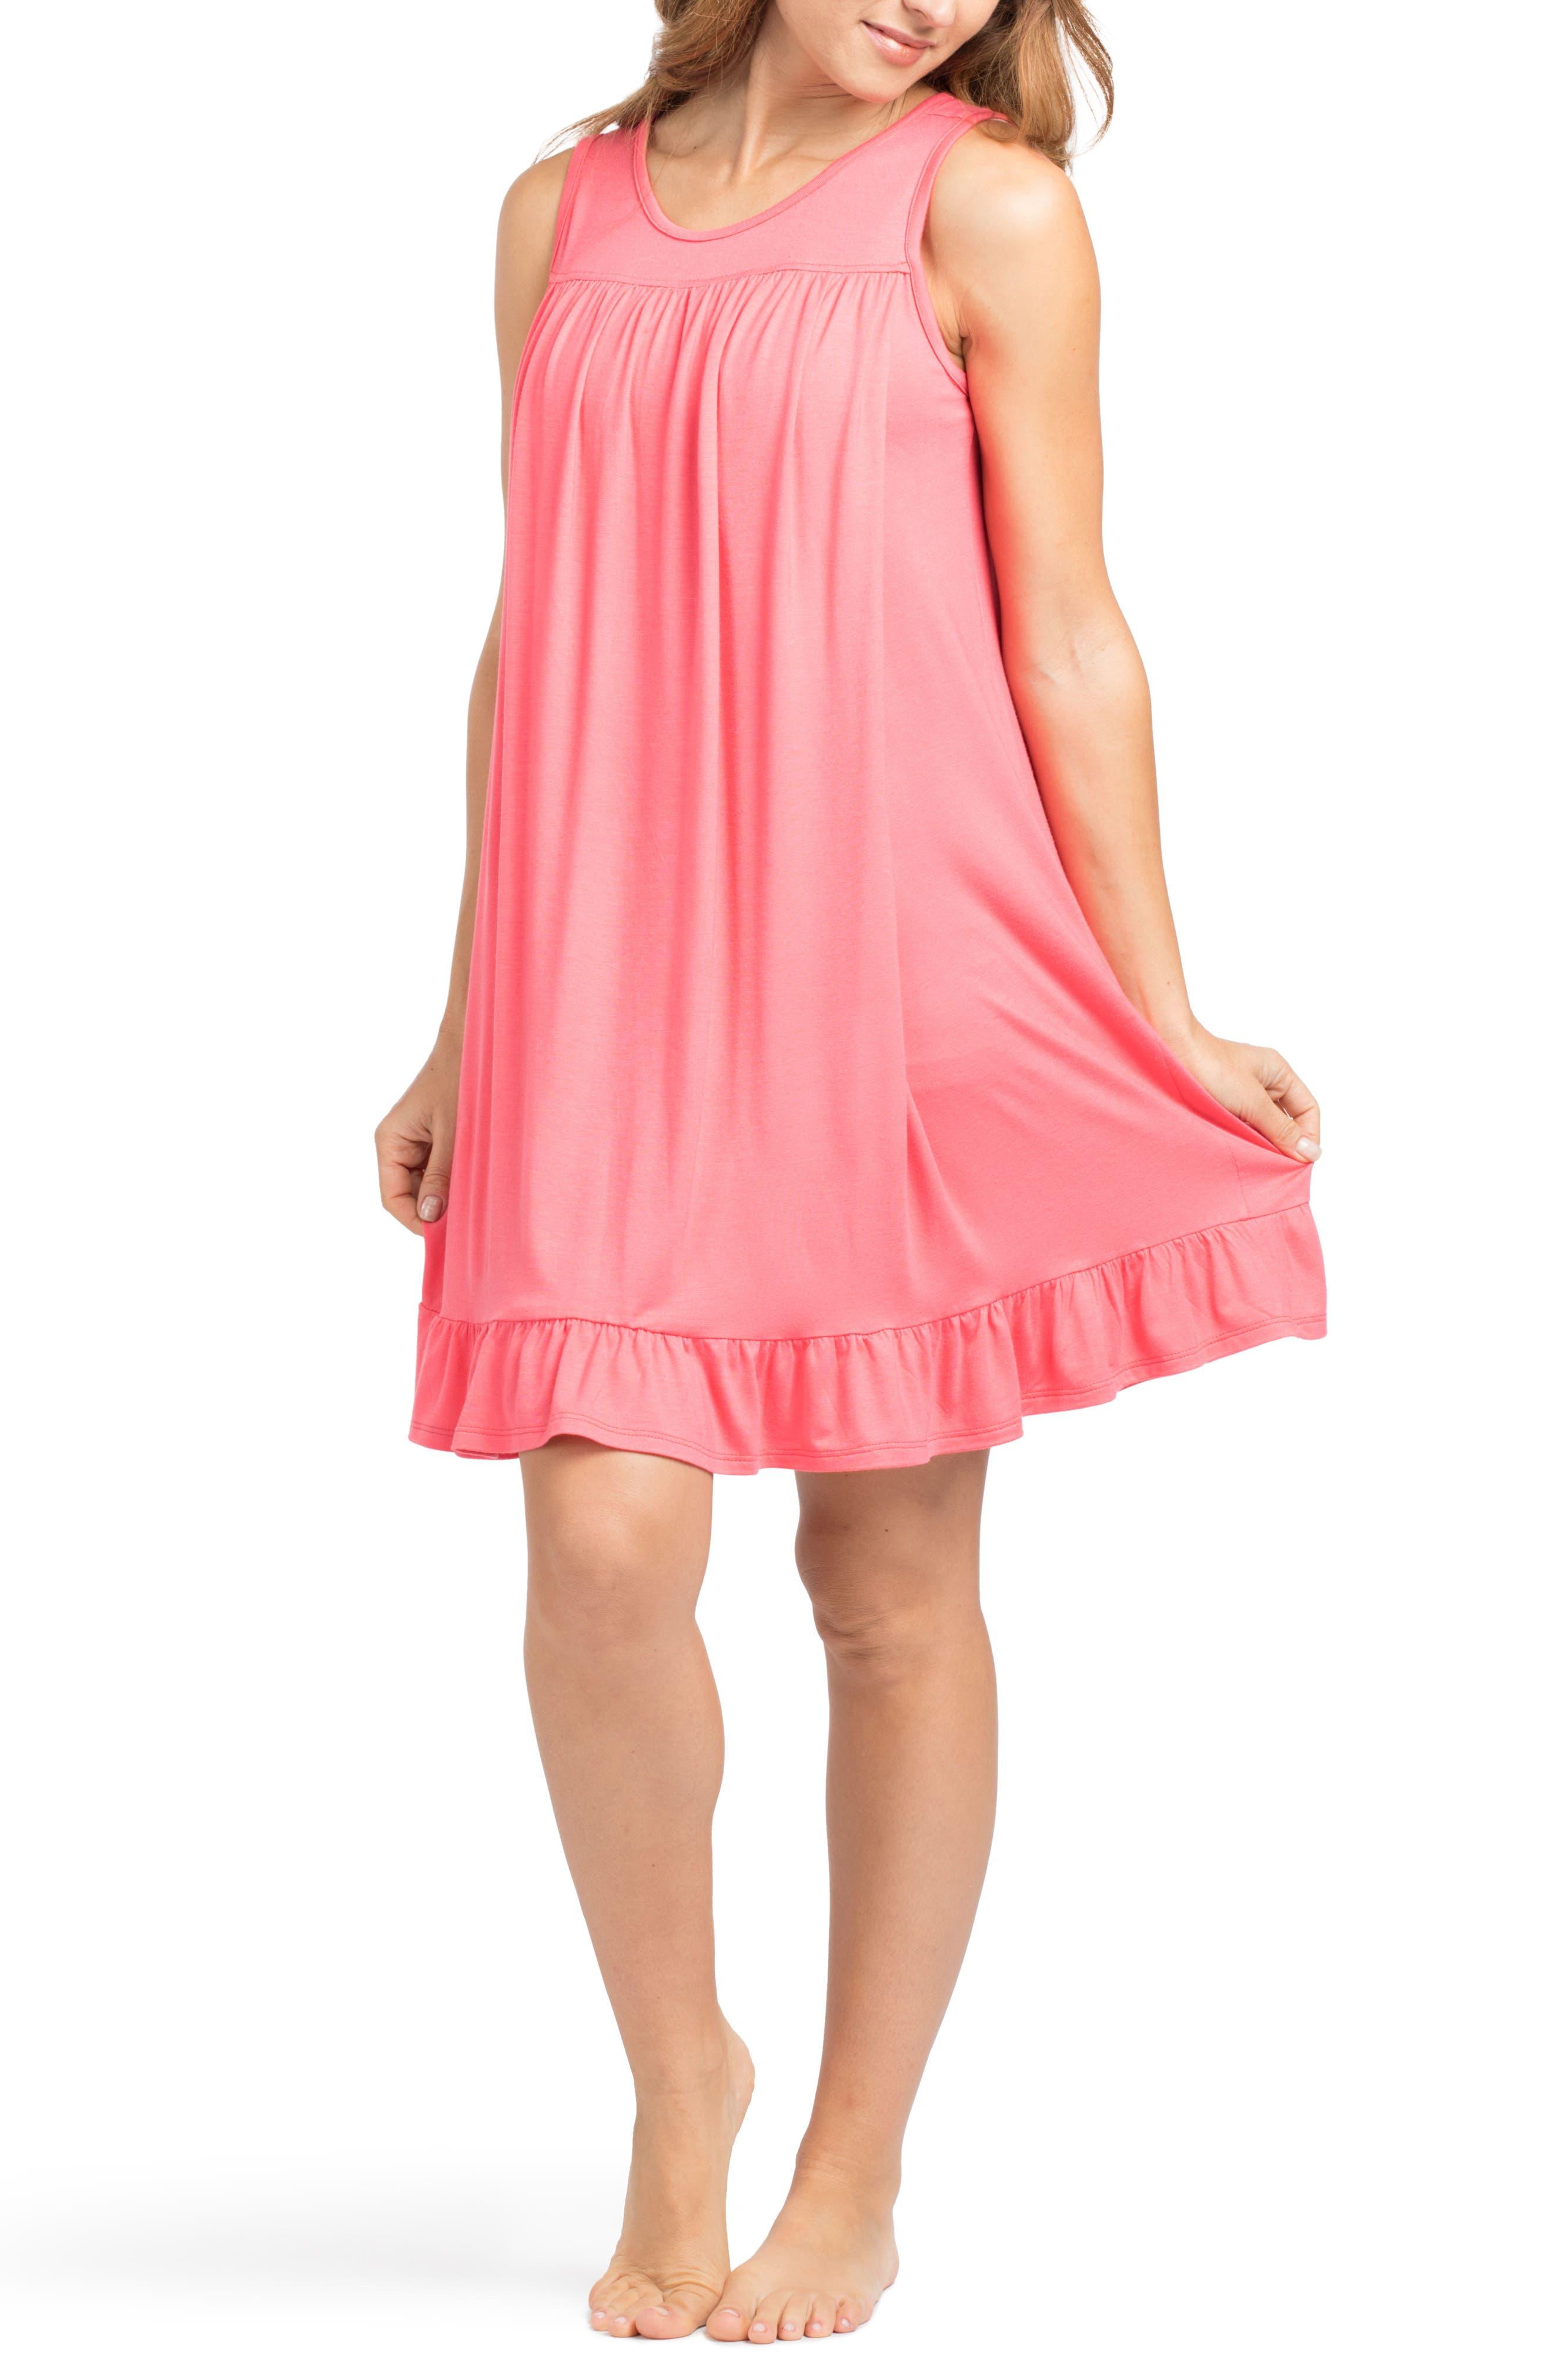 Alternate Image 1 Selected - Savi Mom 'The Ruffled' Sleeveless Maternity/Nursing Nightgown